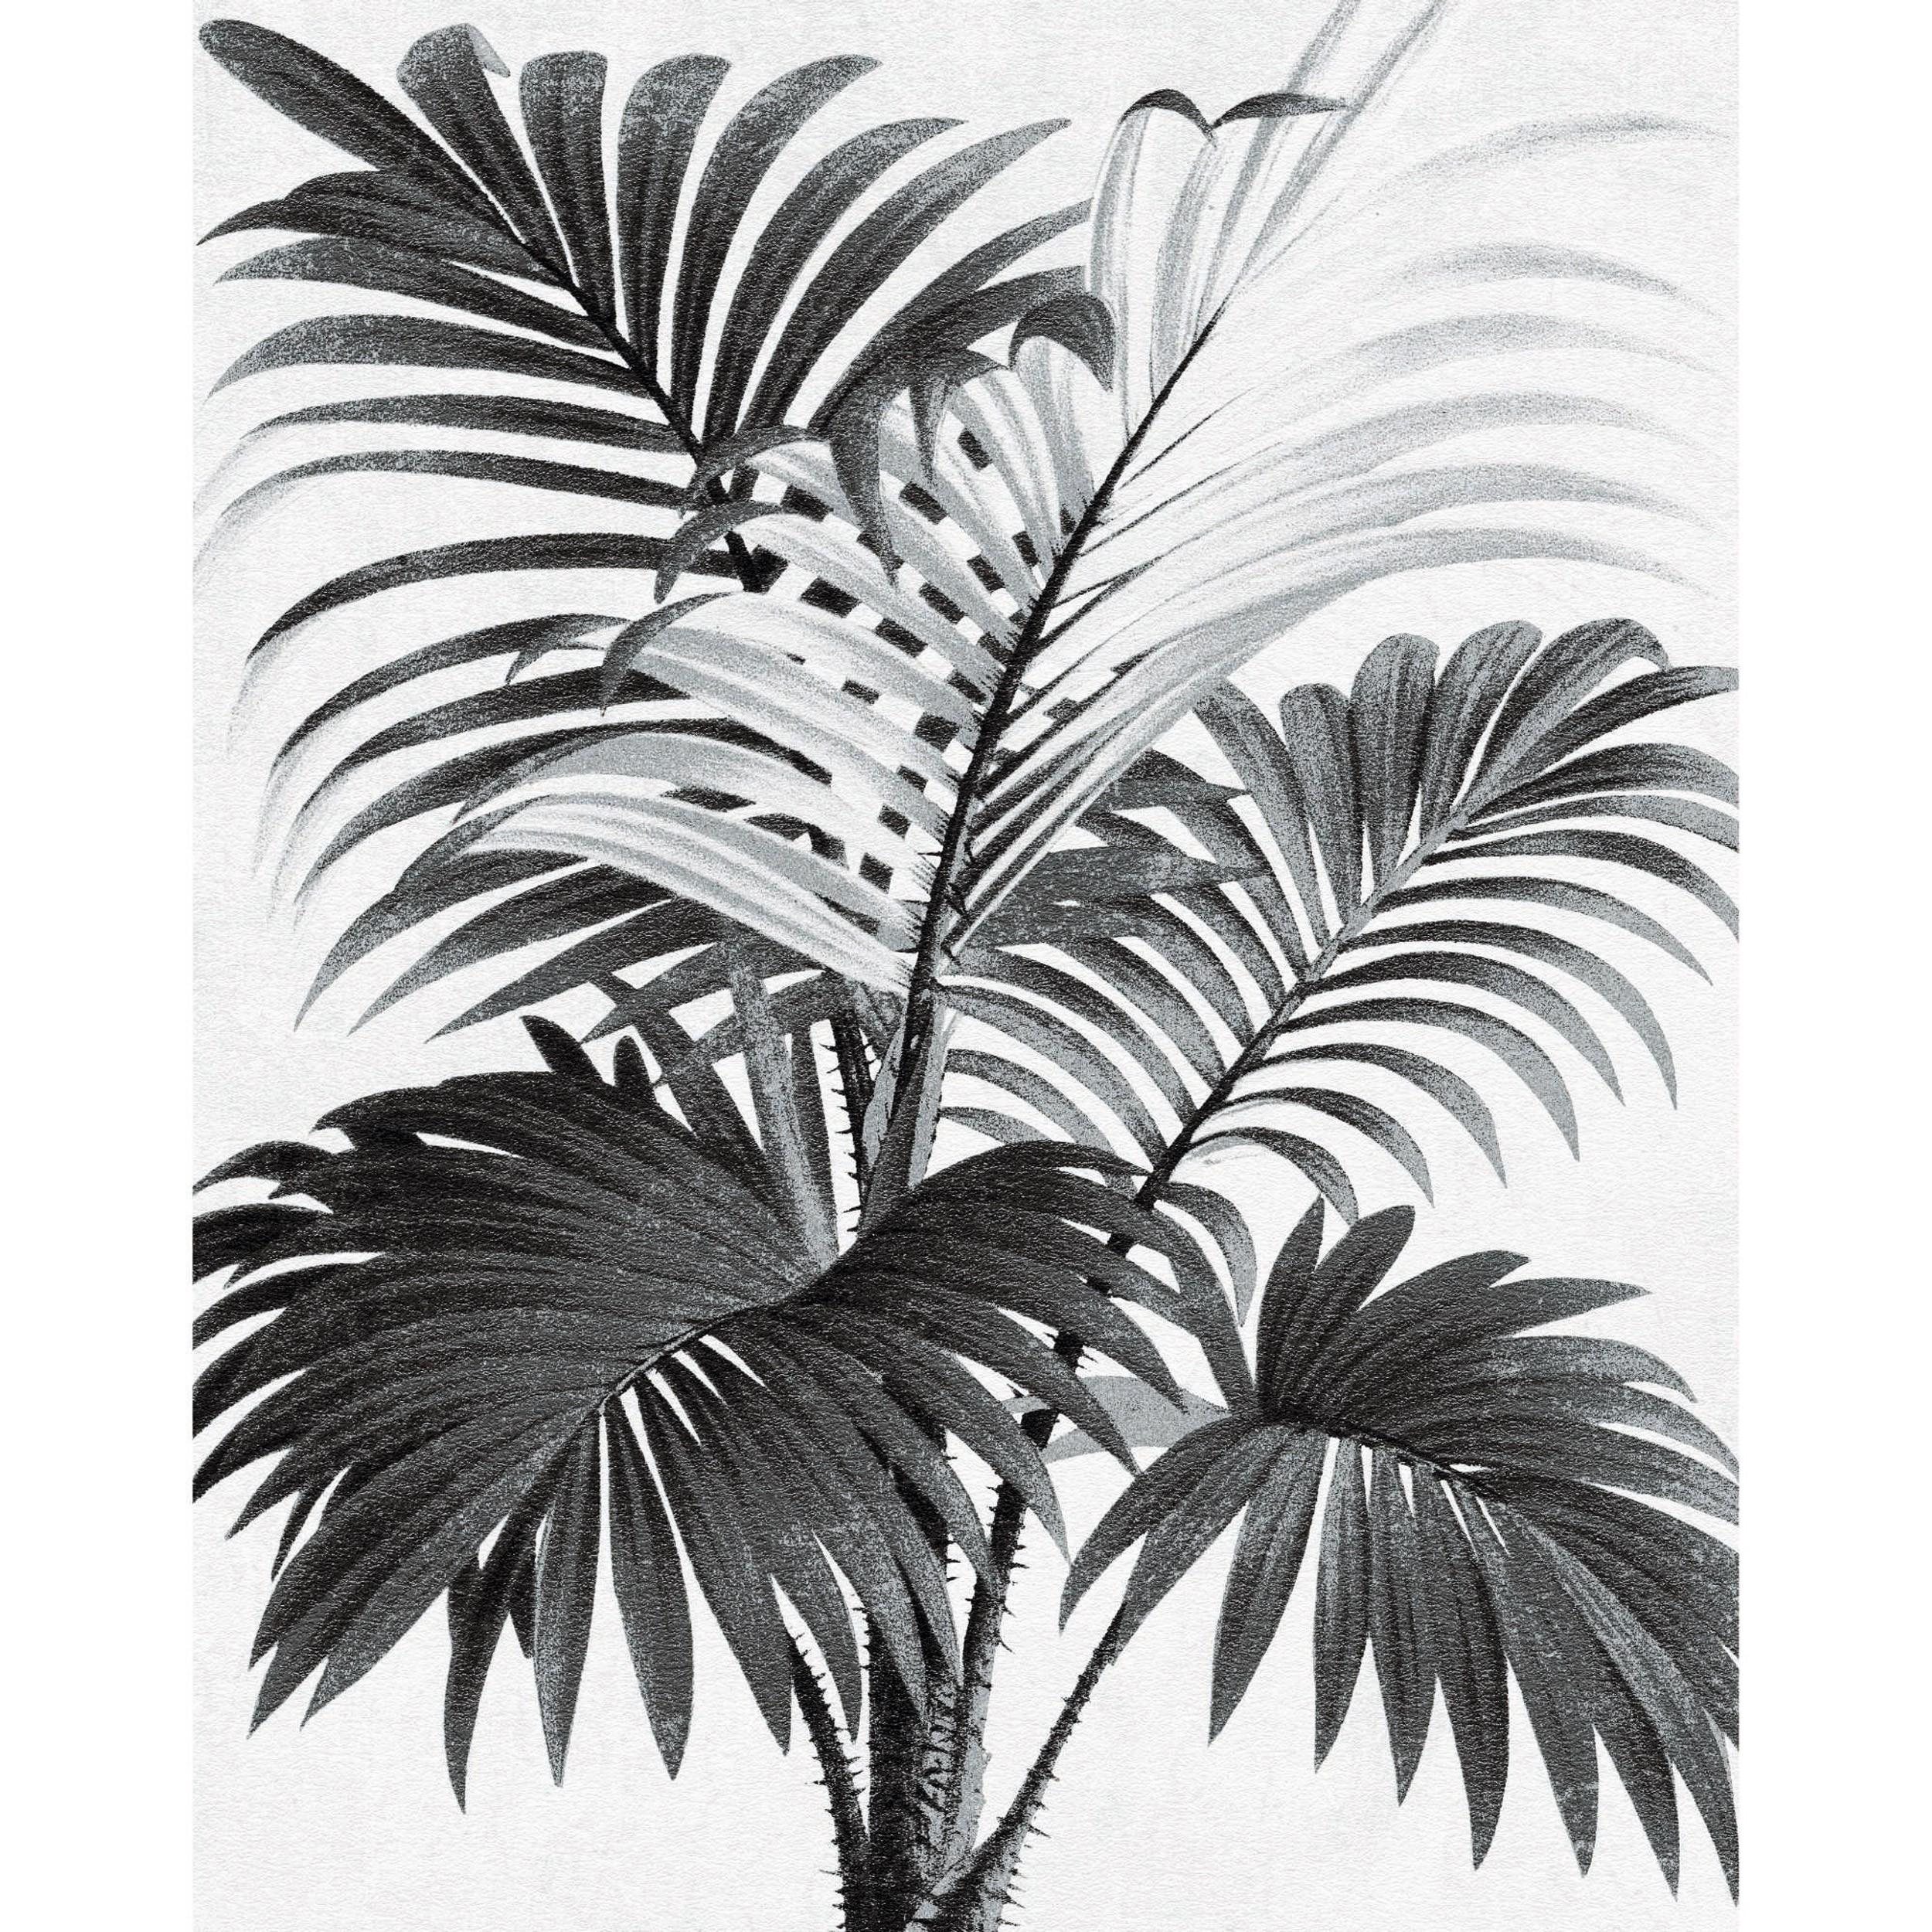 acheter porter 40 x 50 noir blanc palmier